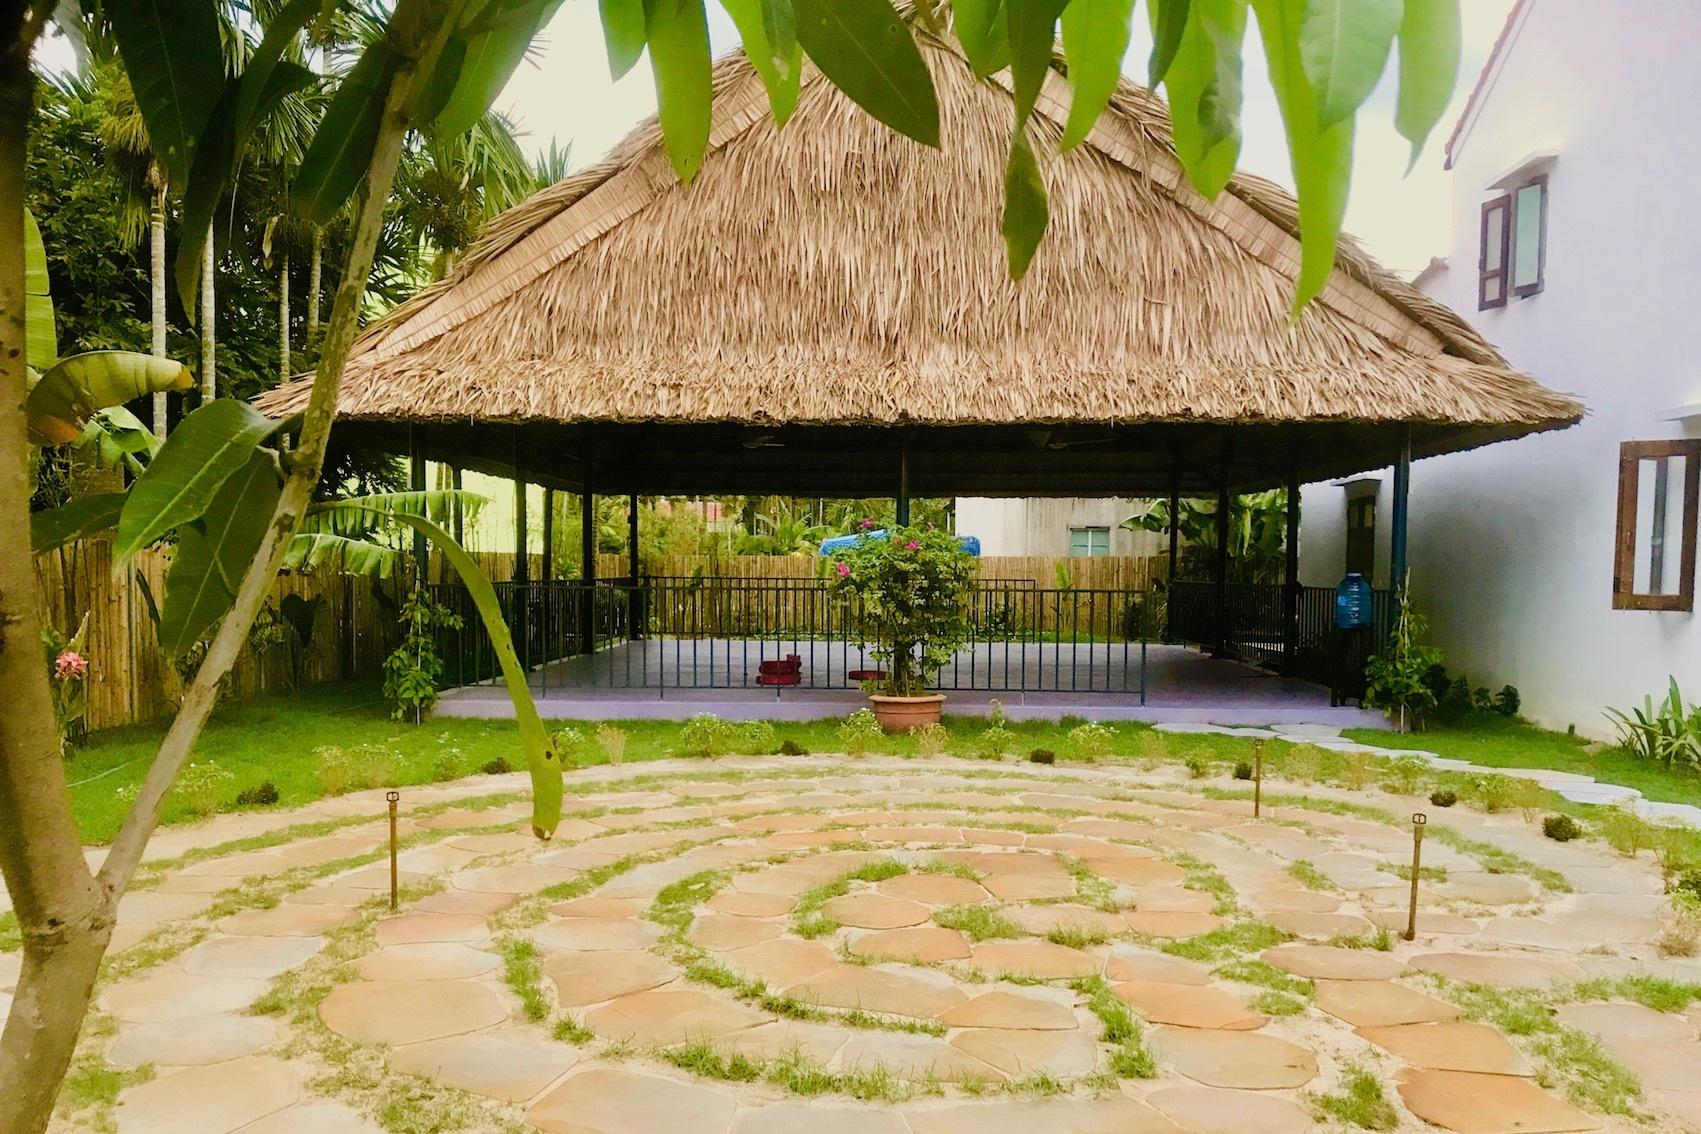 walking-labyrinth-yoga-sala-gratitude-vietnam-2.jpg